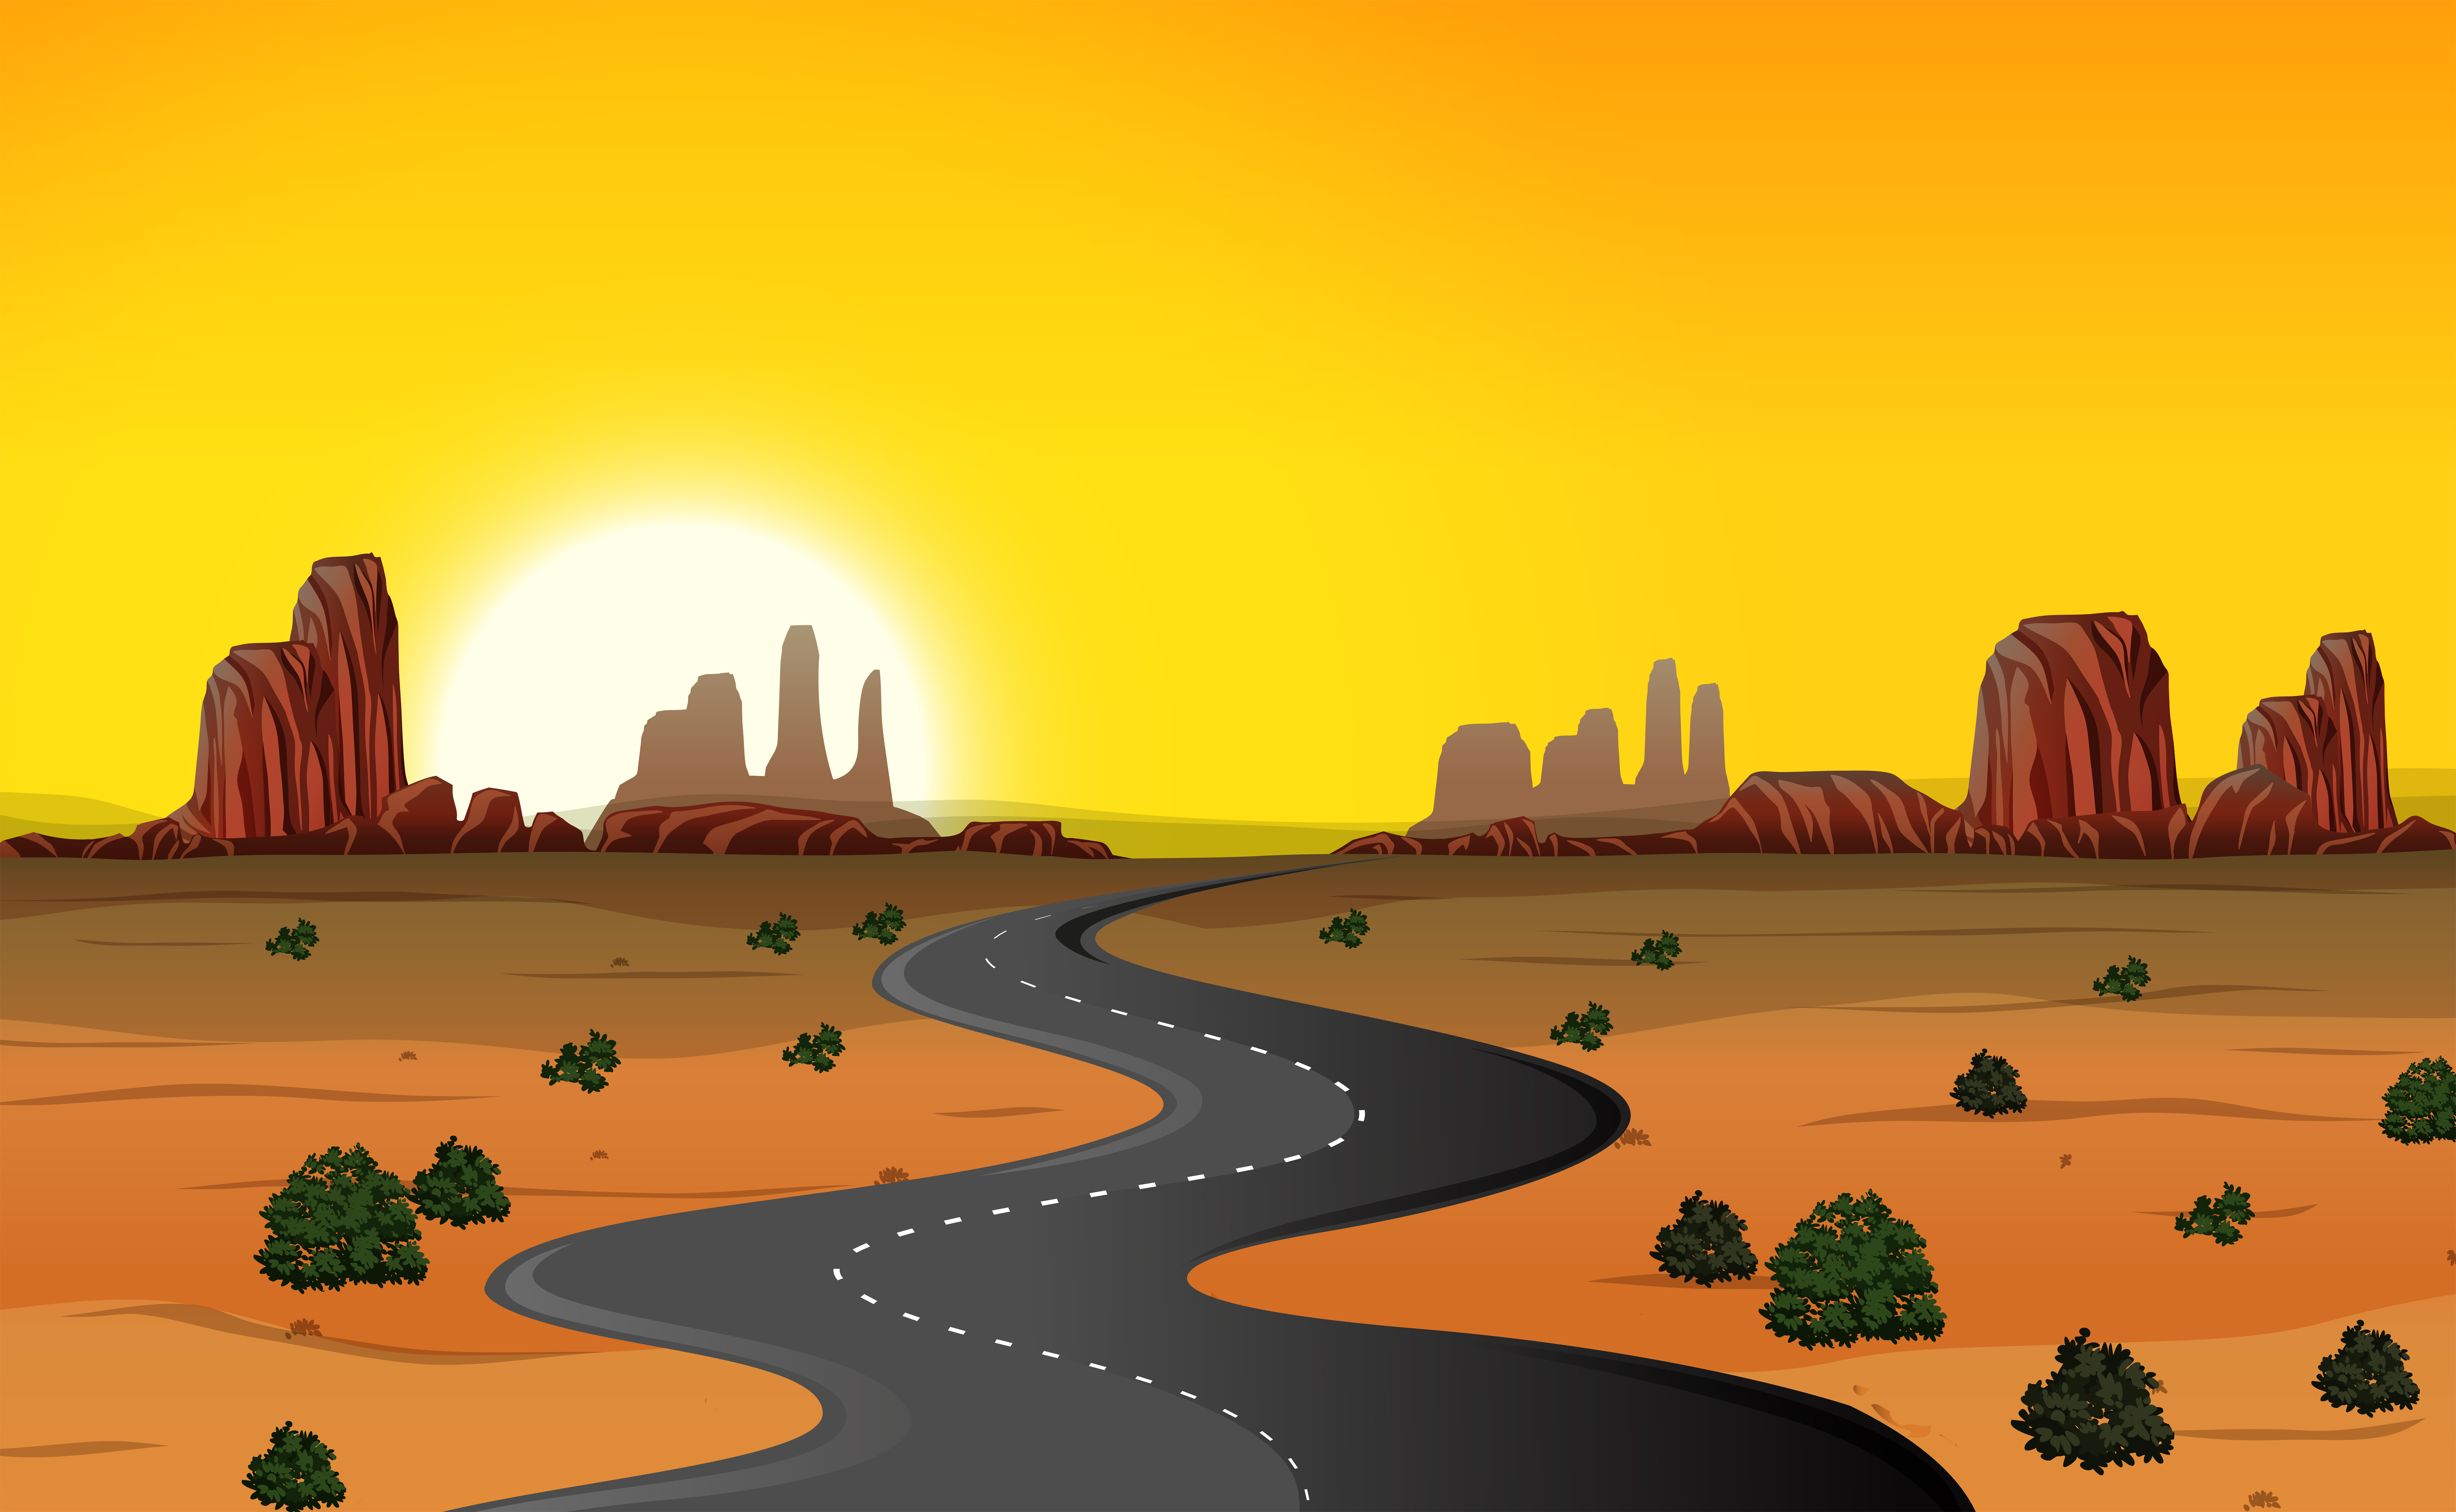 A Desert Road Background Download Free Vectors Clipart Graphics Vector Art